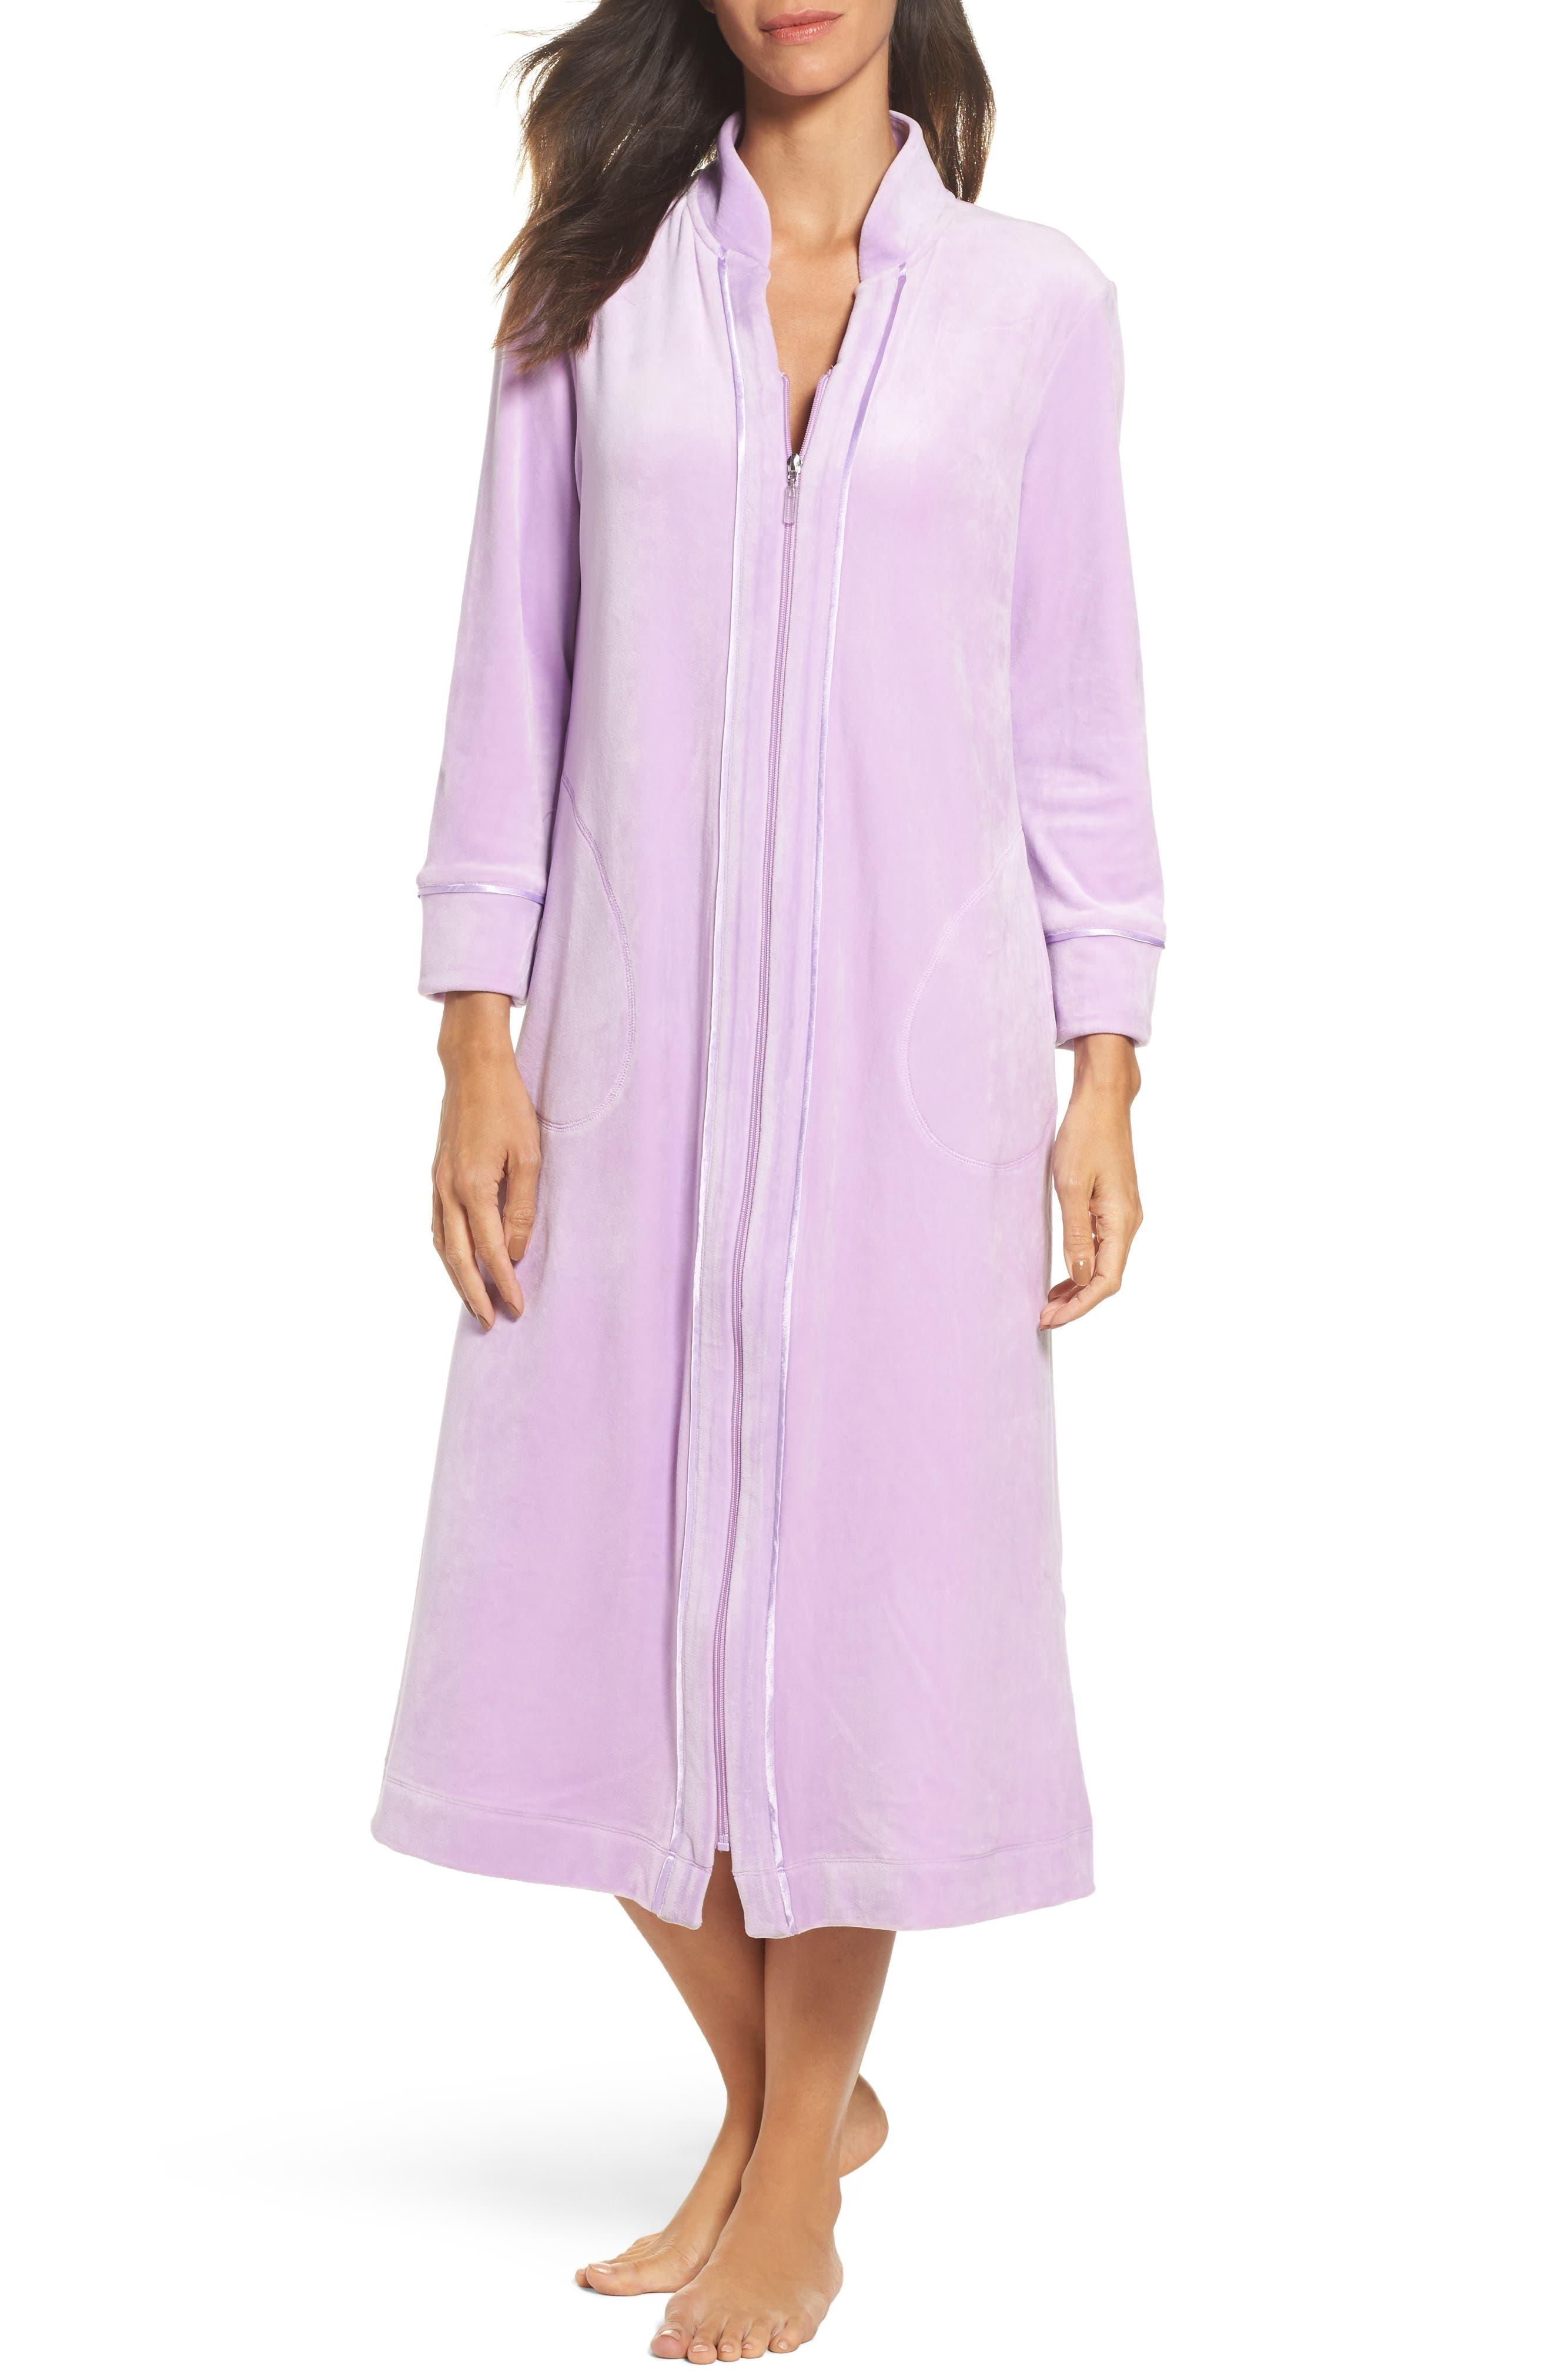 Carole Hochman Velour Zip Robe